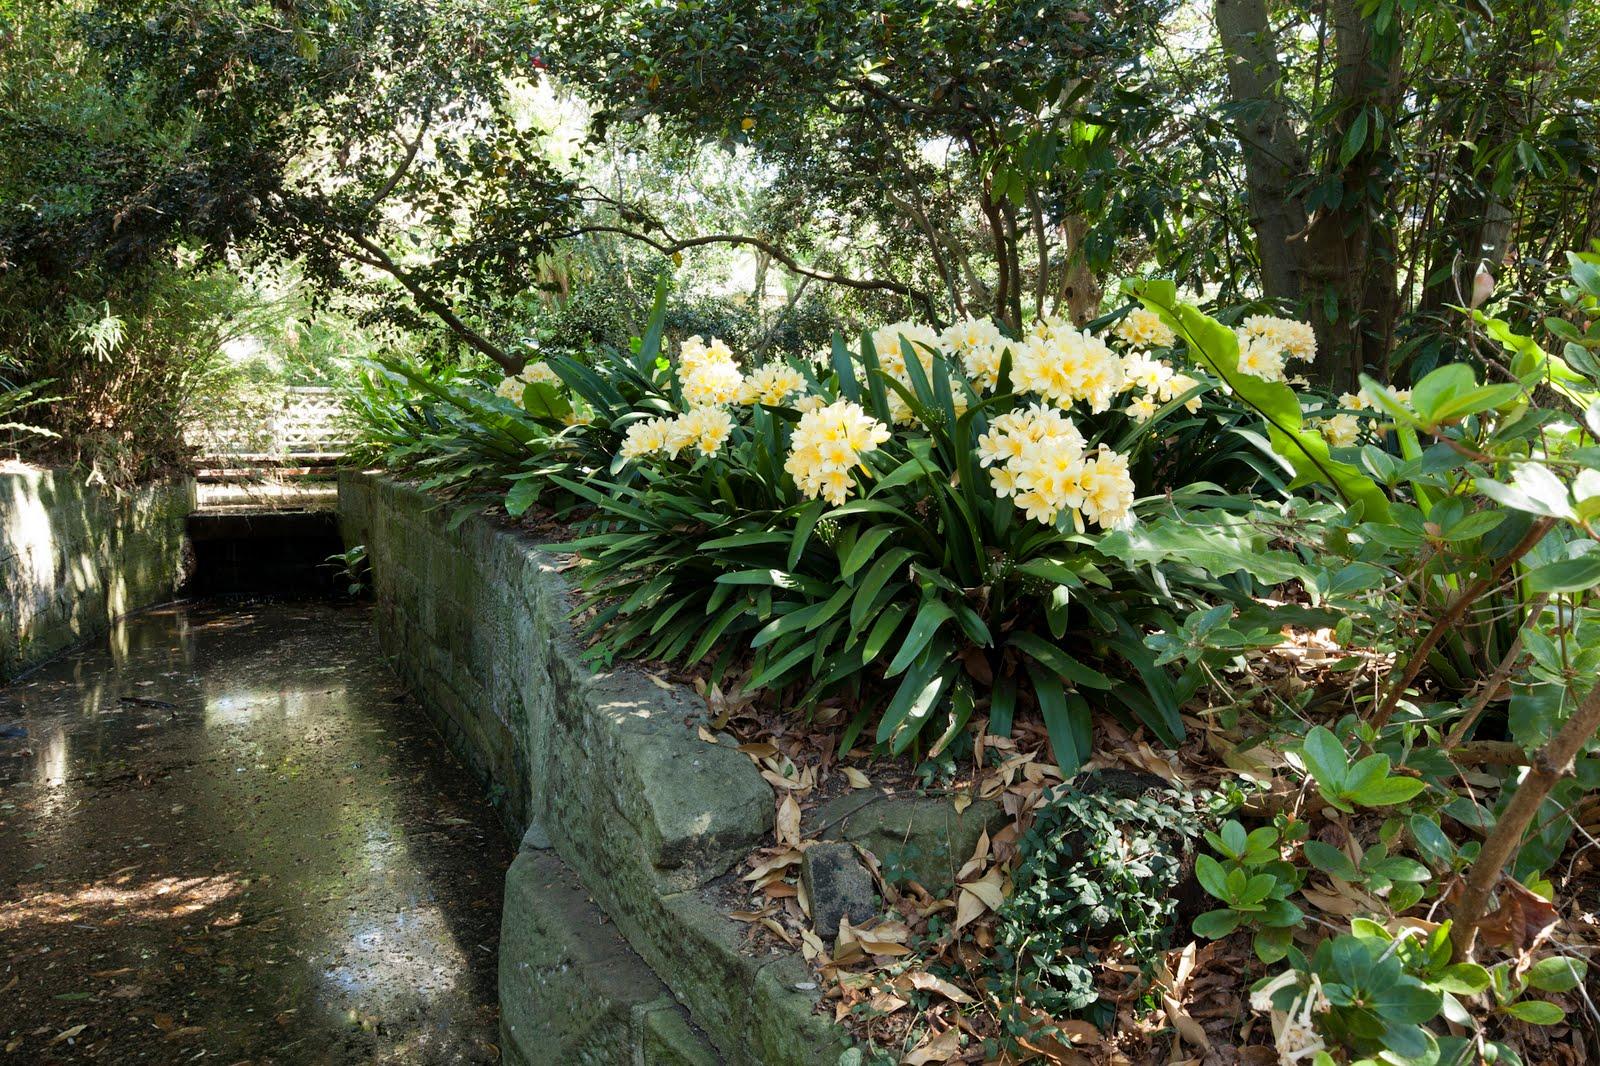 Garden sketchabout the royal botanic garden sydney for Landscape gardeners sydney